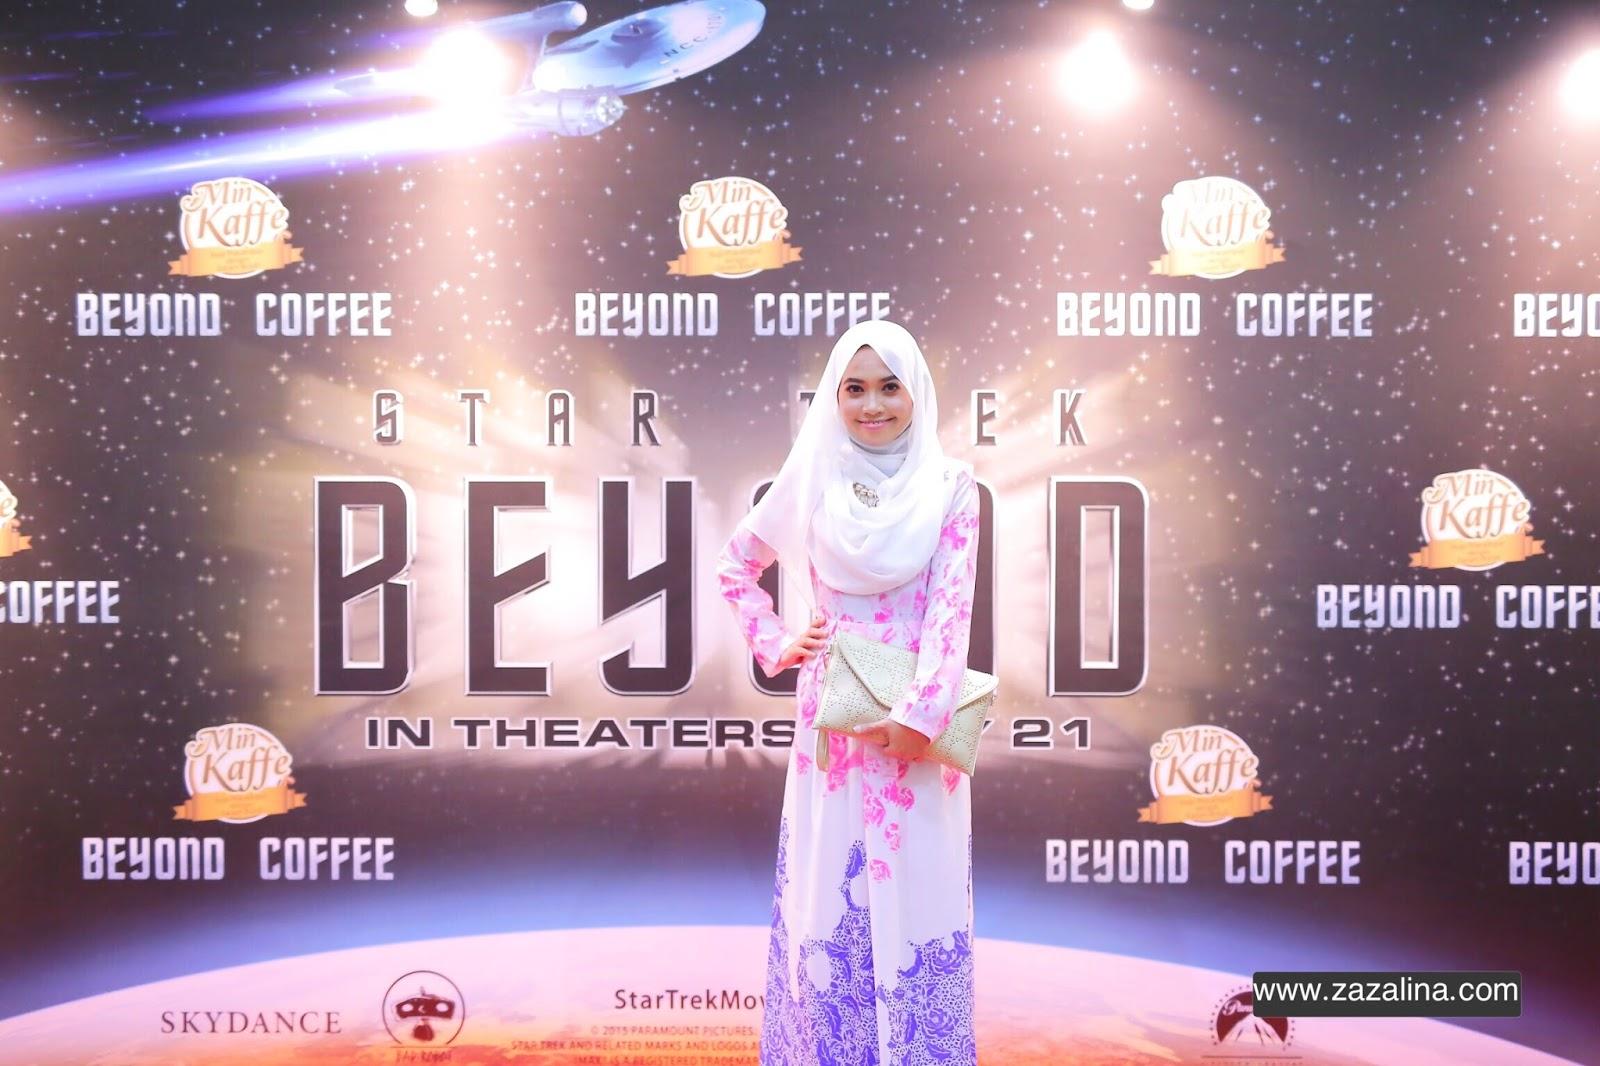 Min Kaffe Pengedar Testimoni Star Trek Beyond